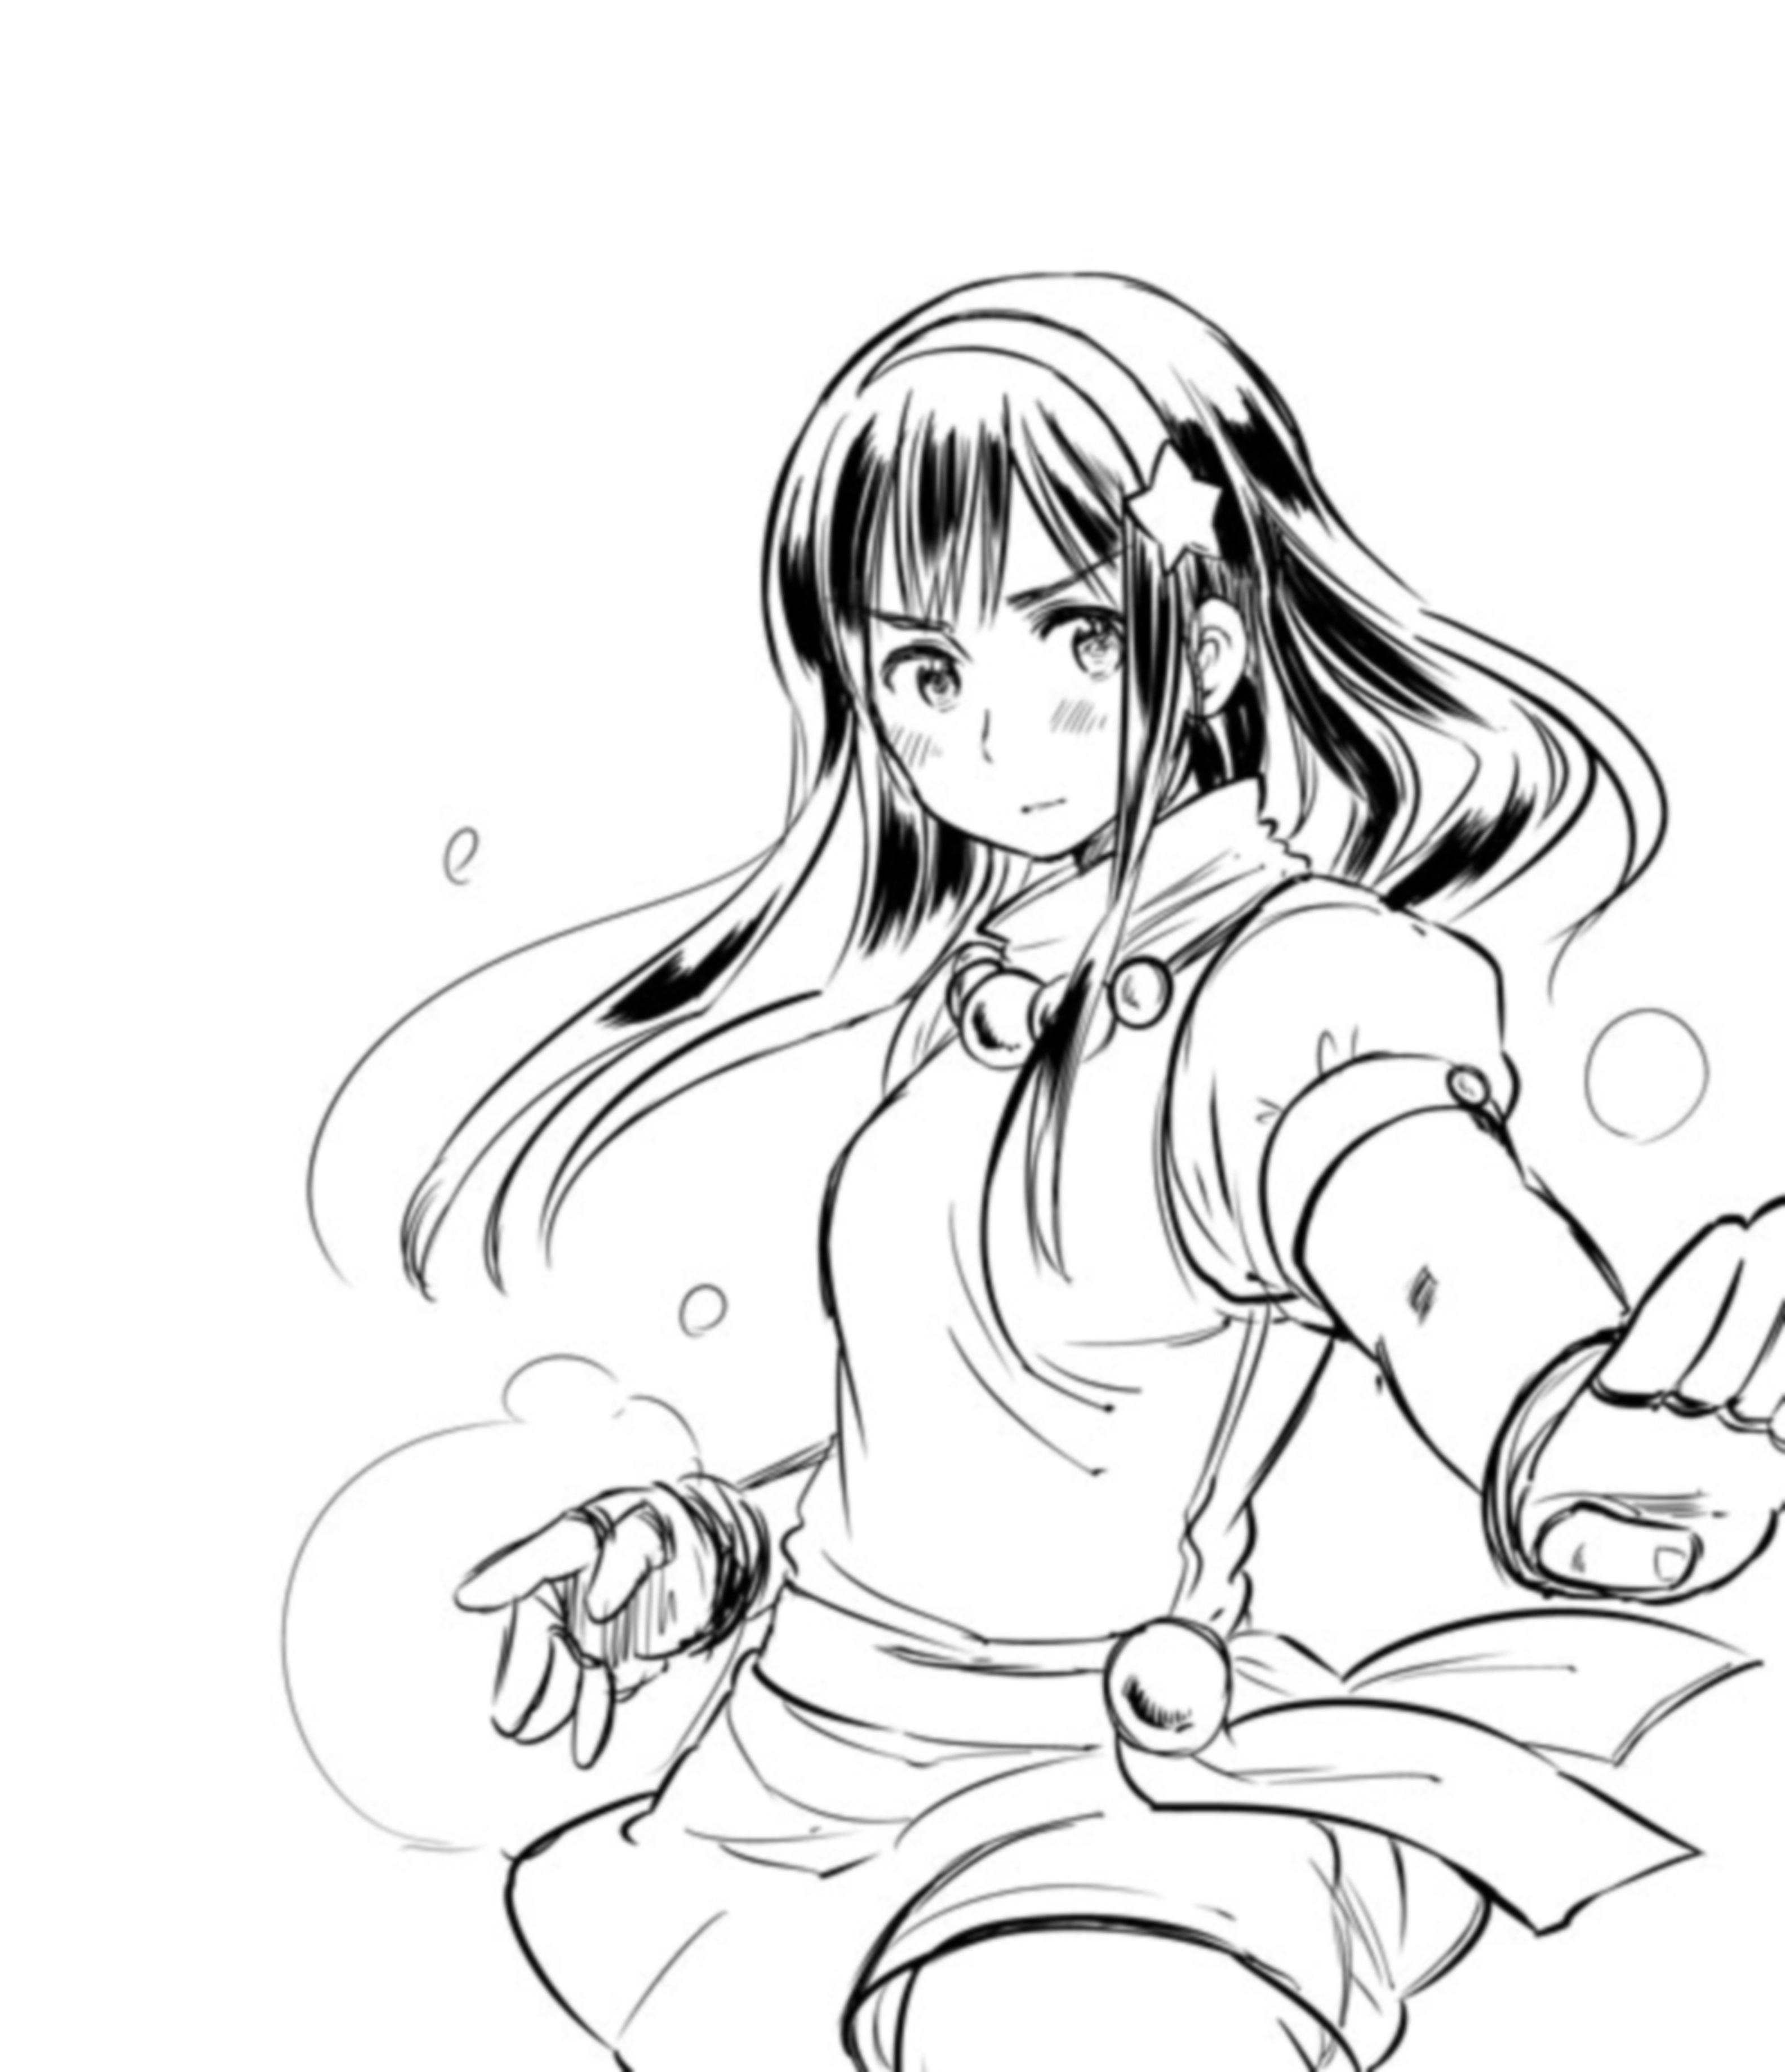 Zerochan Lineart : Athena king of fighters image zerochan anime